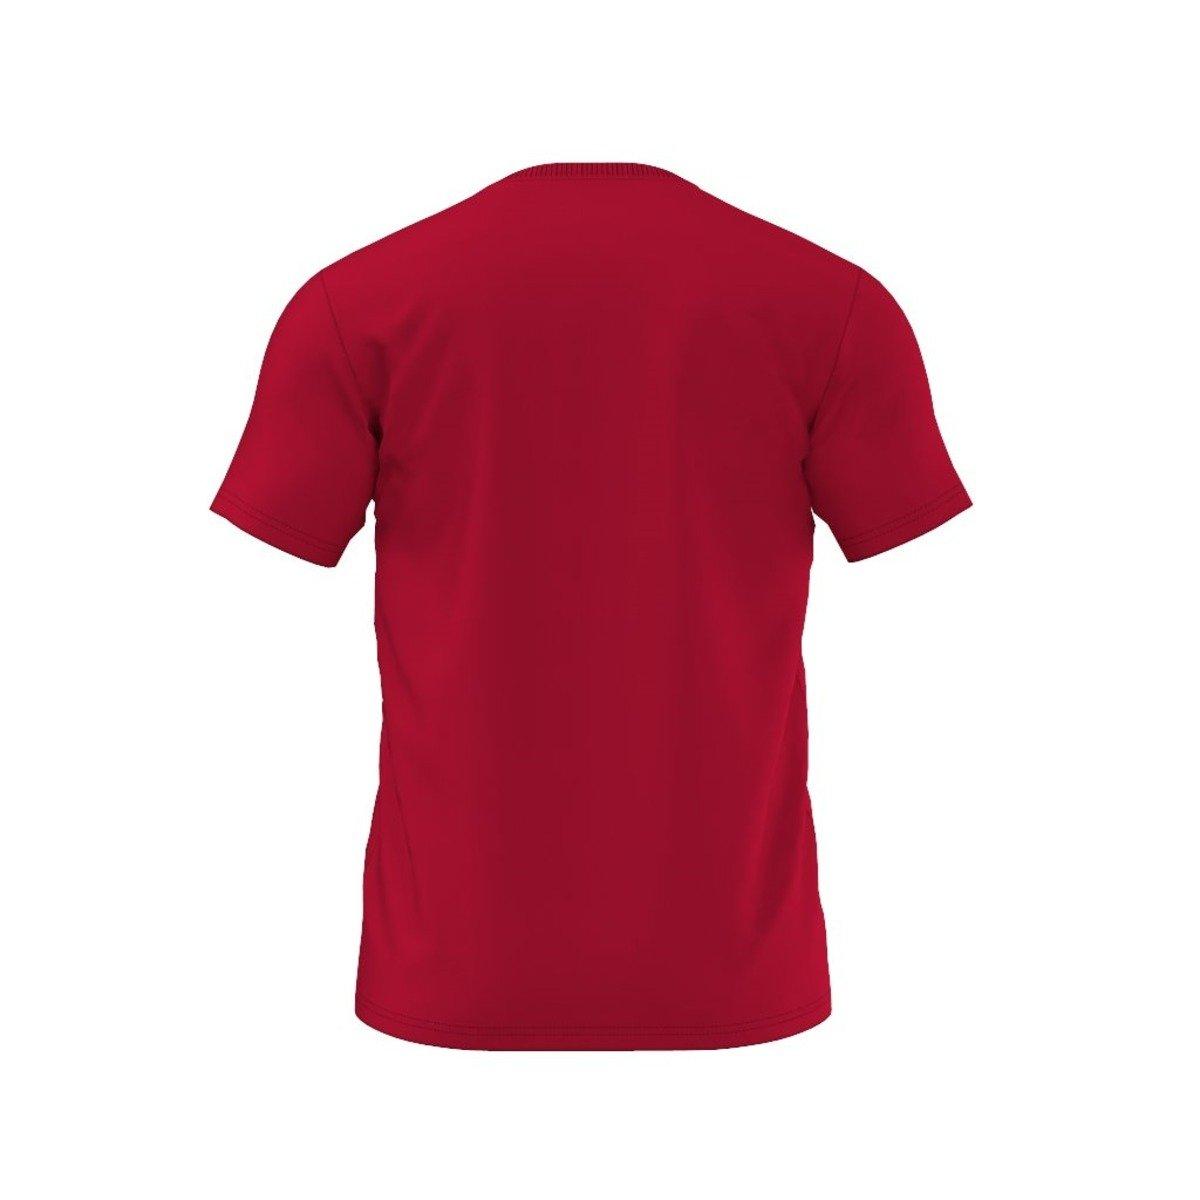 Adidas chicago bulls tee 3 t shirt ap5726 basketball for Adidas custom t shirts